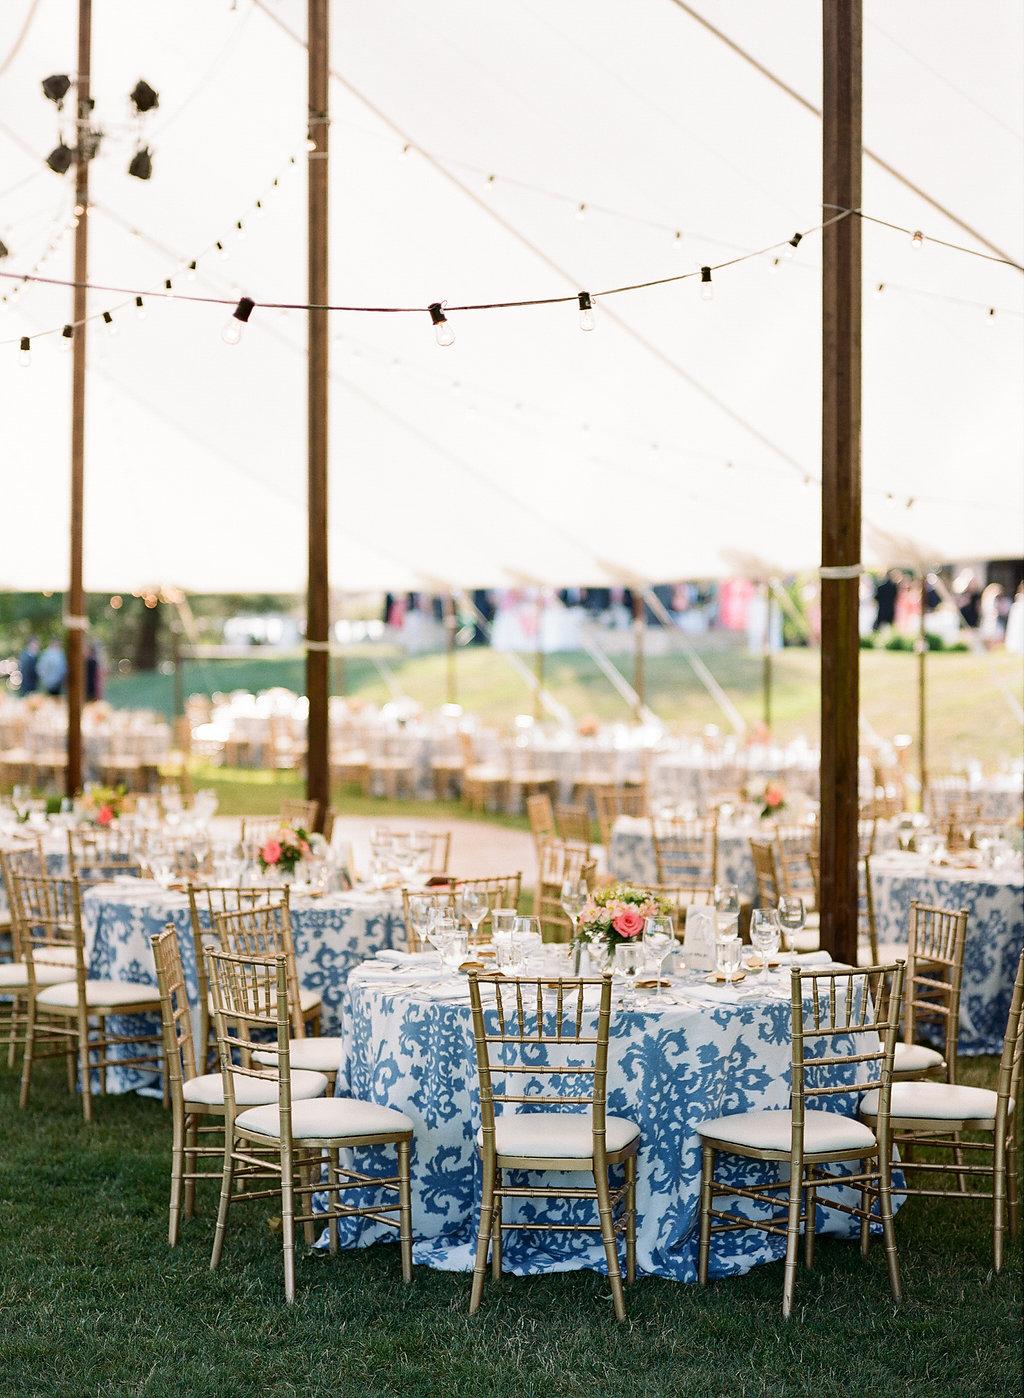 Cameron-Powel-Wes-Mize-wedding-20160618-456.jpg